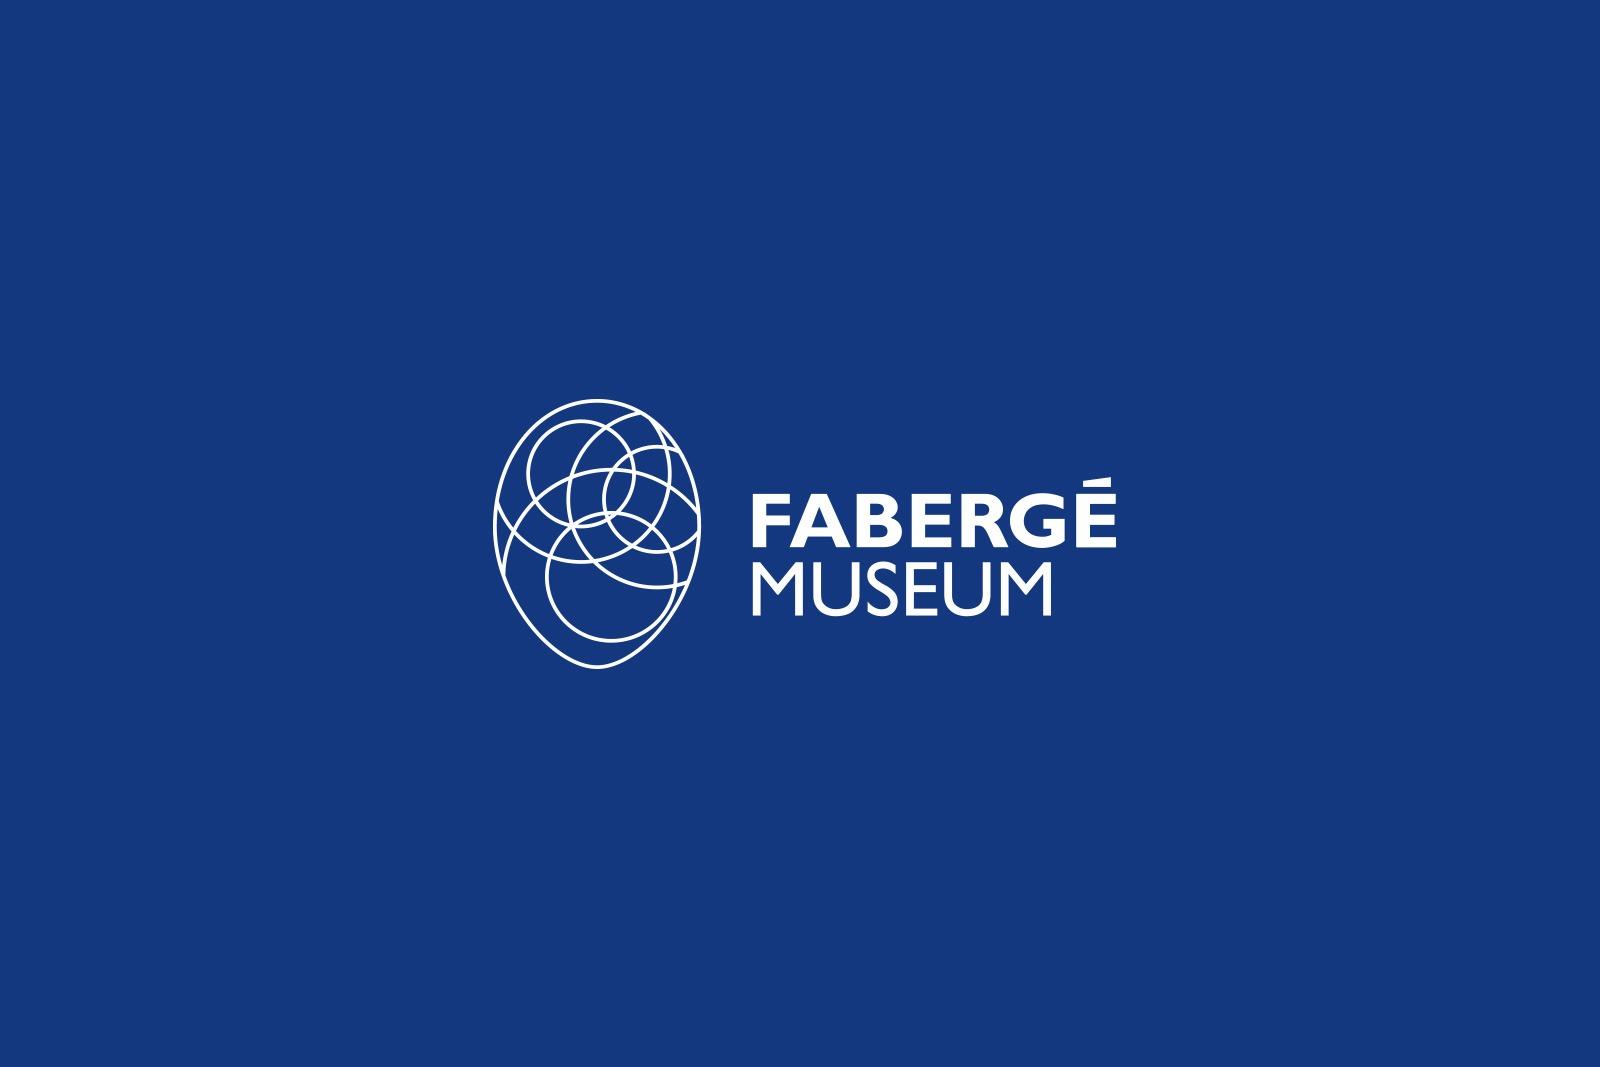 Faberge Museum logo, Asgard, музейный брендинг, Faberge egg